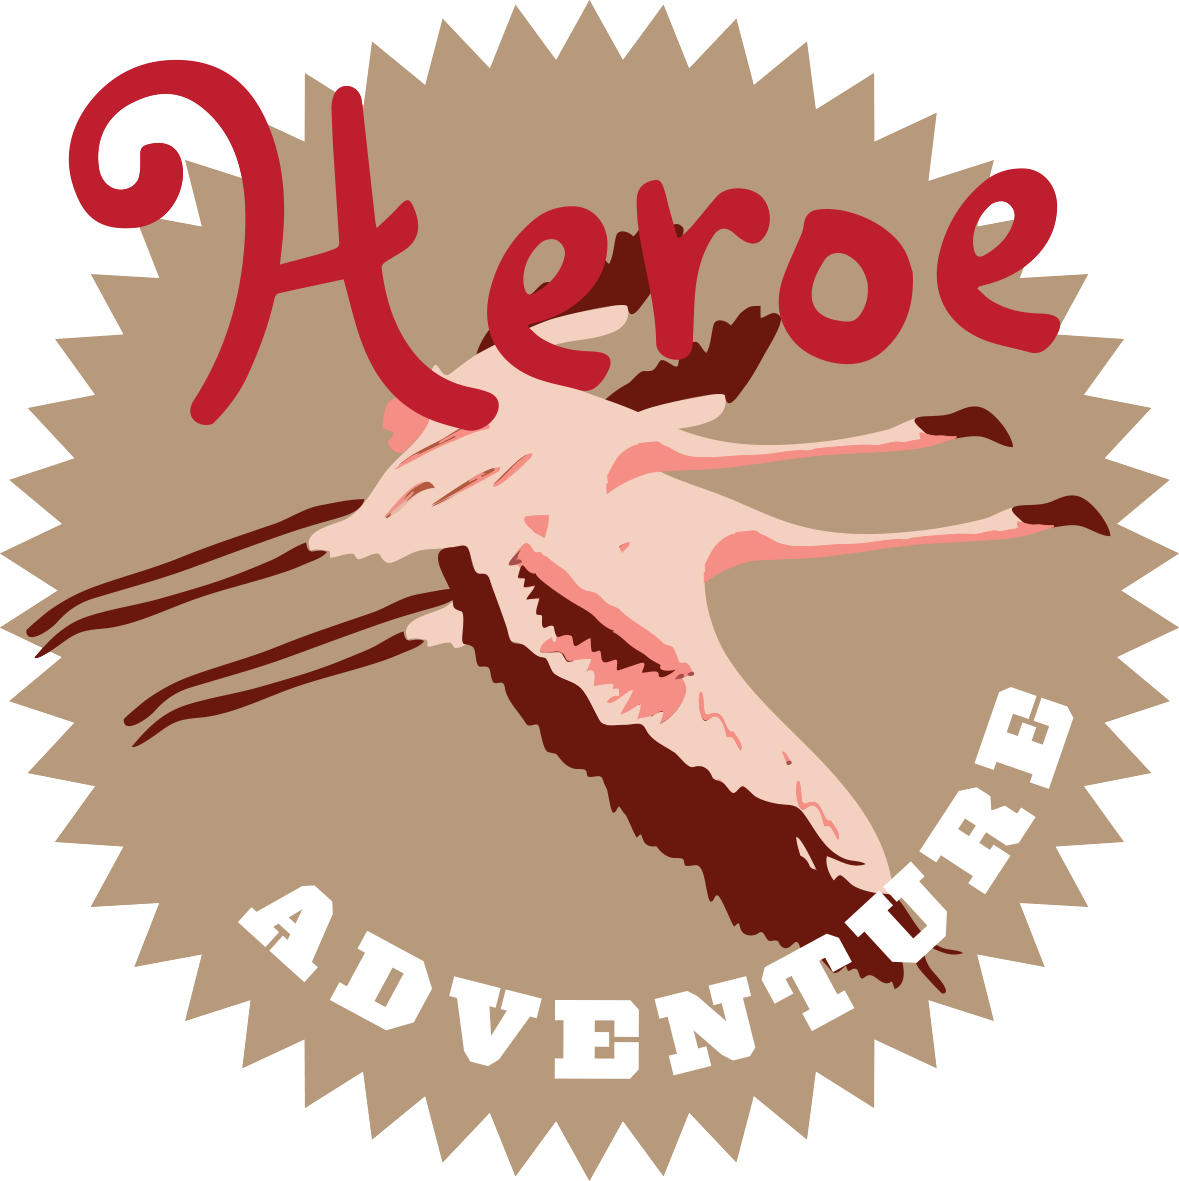 Hike clipart adventure tourism. Heroe safari tanzania specialist